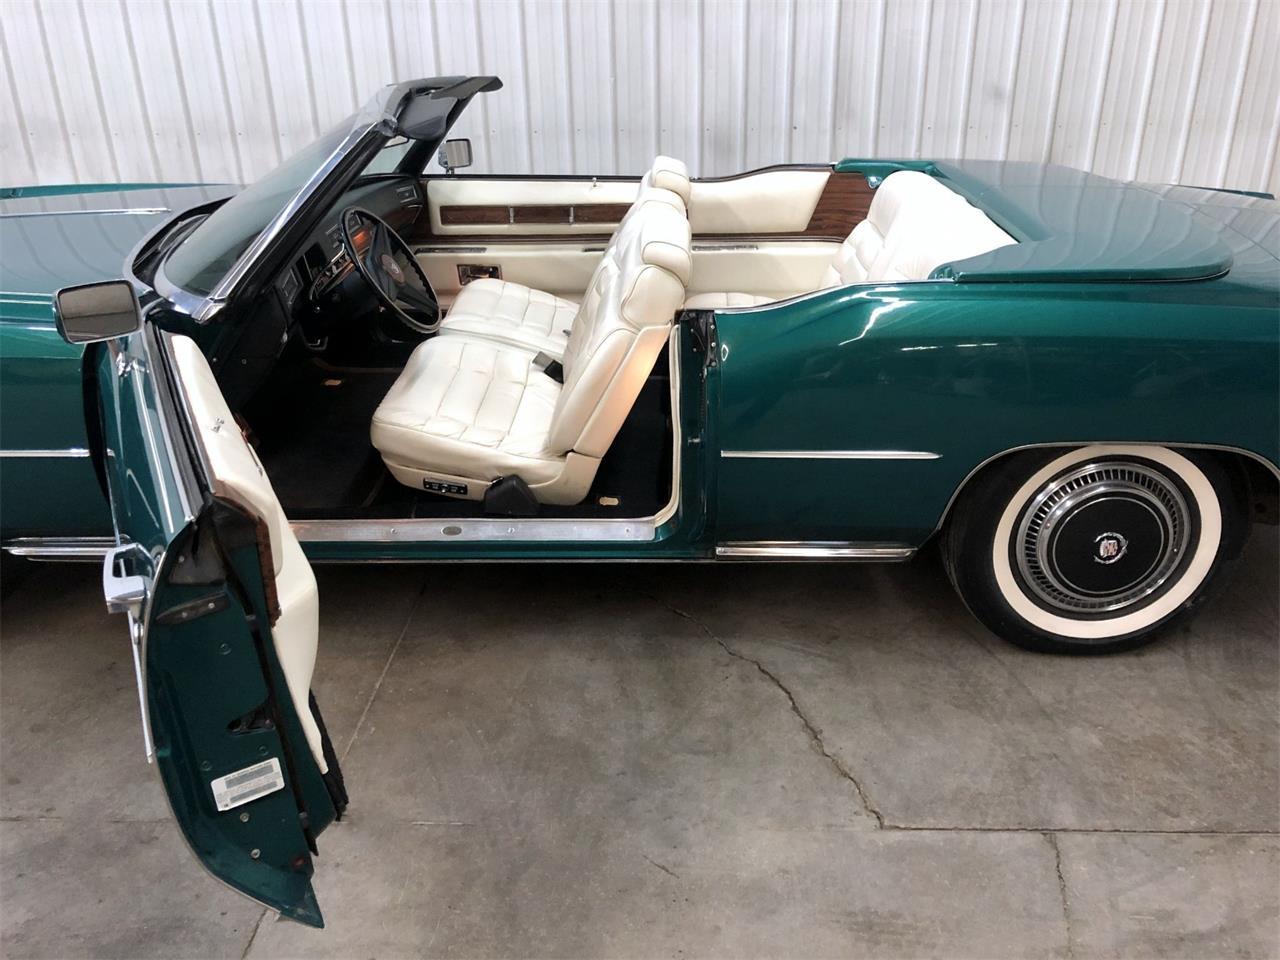 1976 Cadillac Eldorado (CC-1314958) for sale in Maple Lake, Minnesota